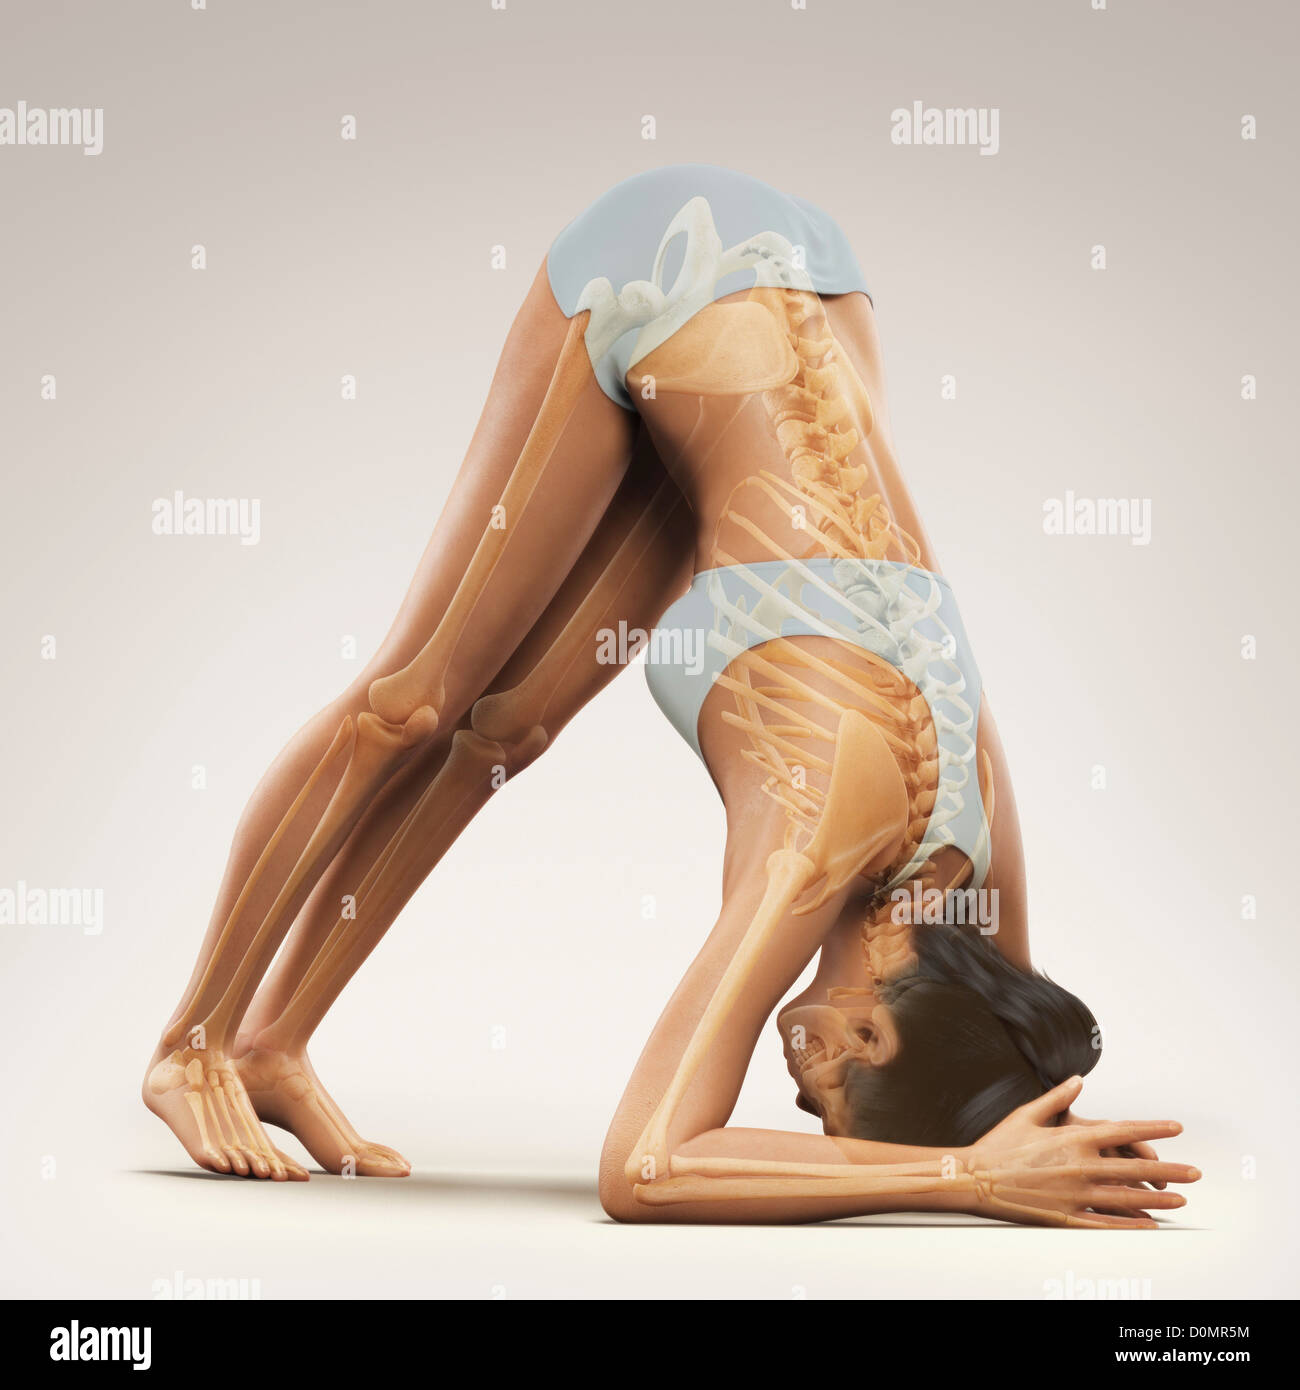 Skeletal Posture Pictures 105